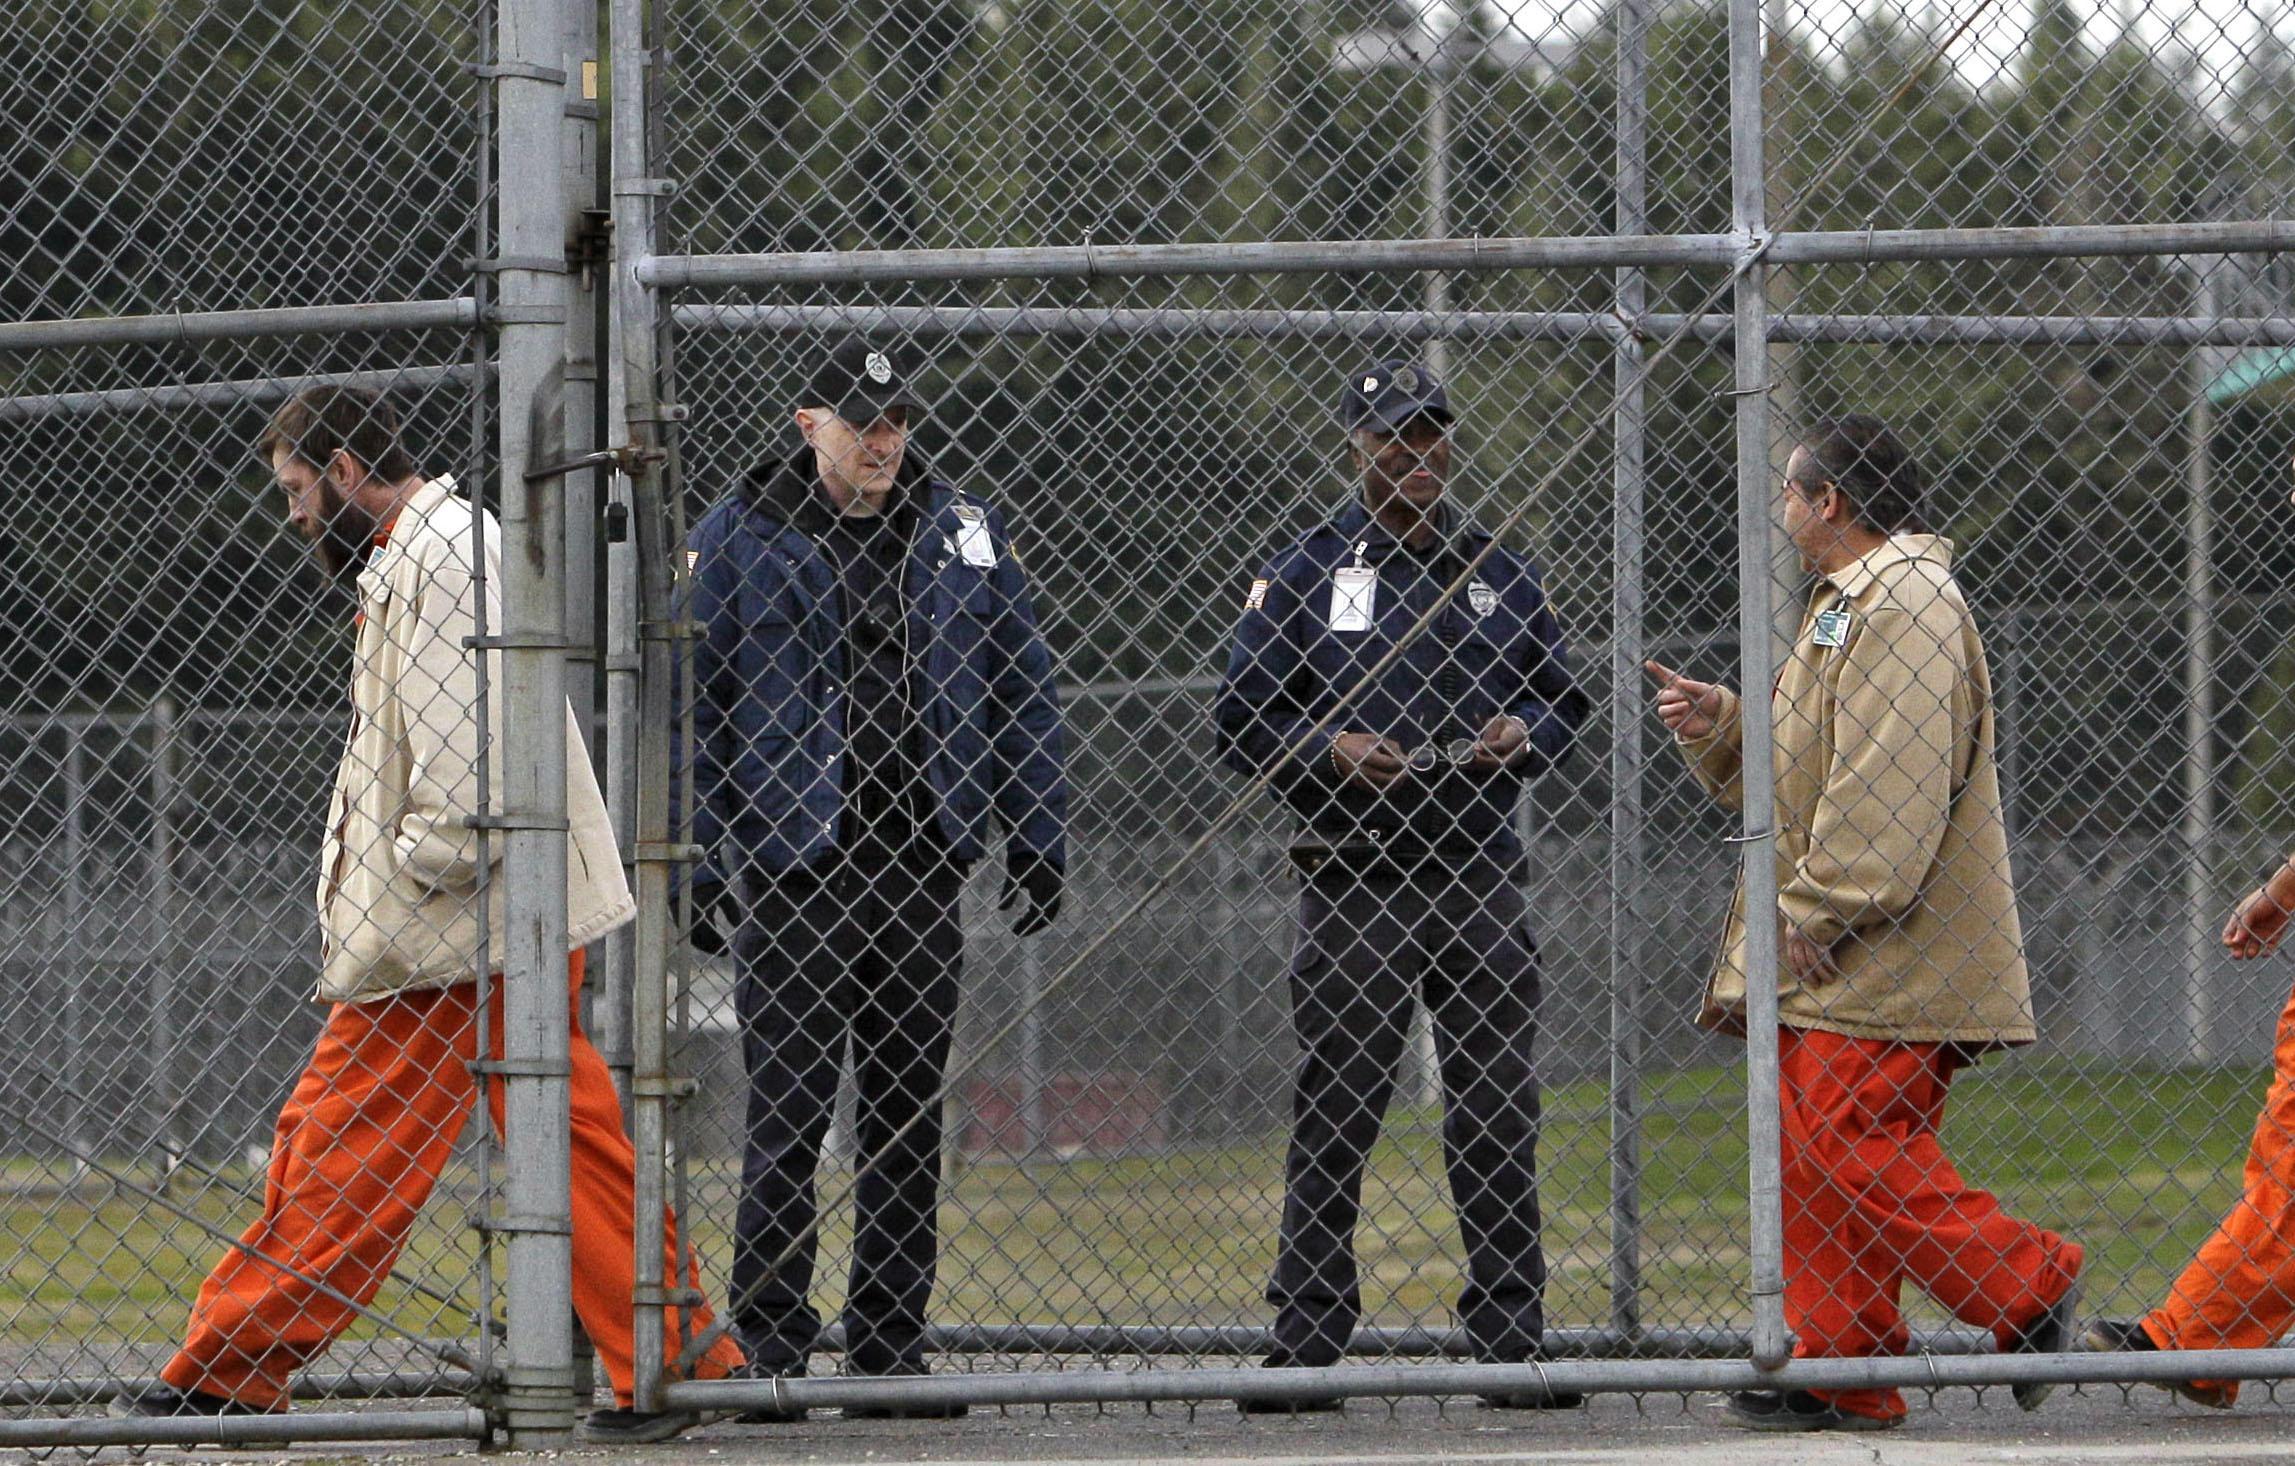 Prisoners released